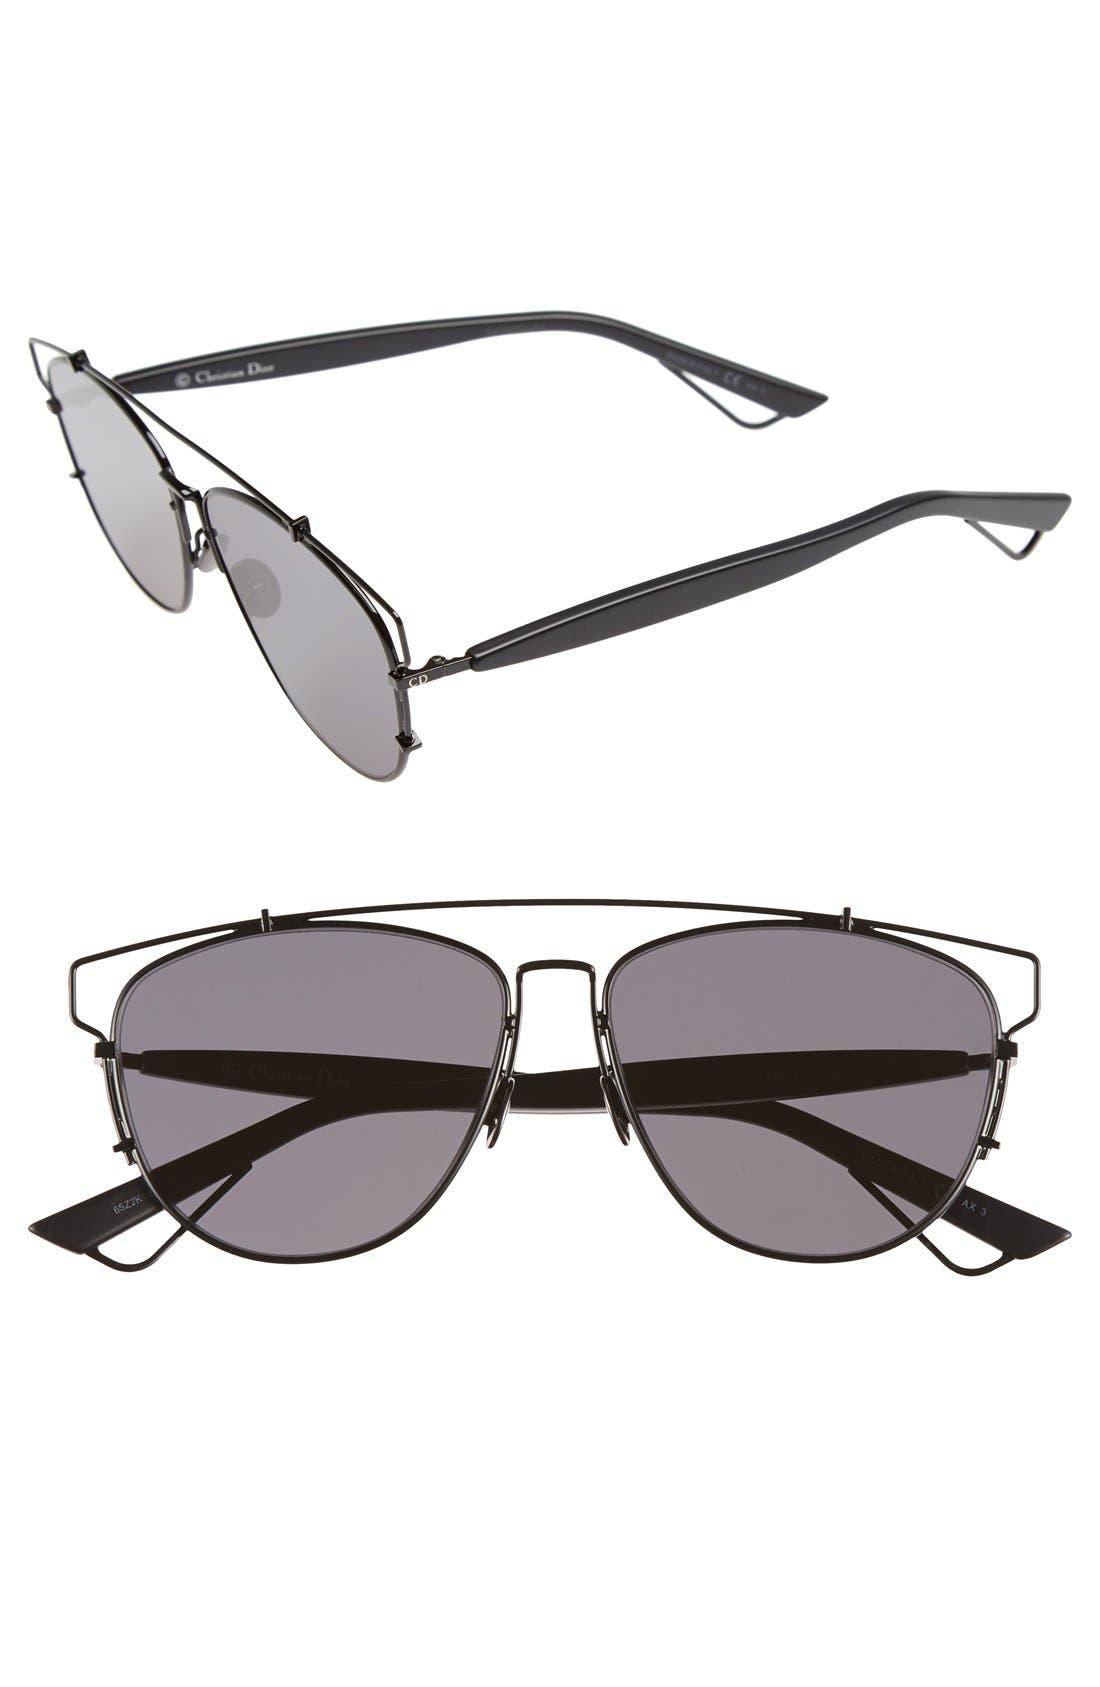 Technologic 57mm Brow Bar Sunglasses,                             Main thumbnail 4, color,